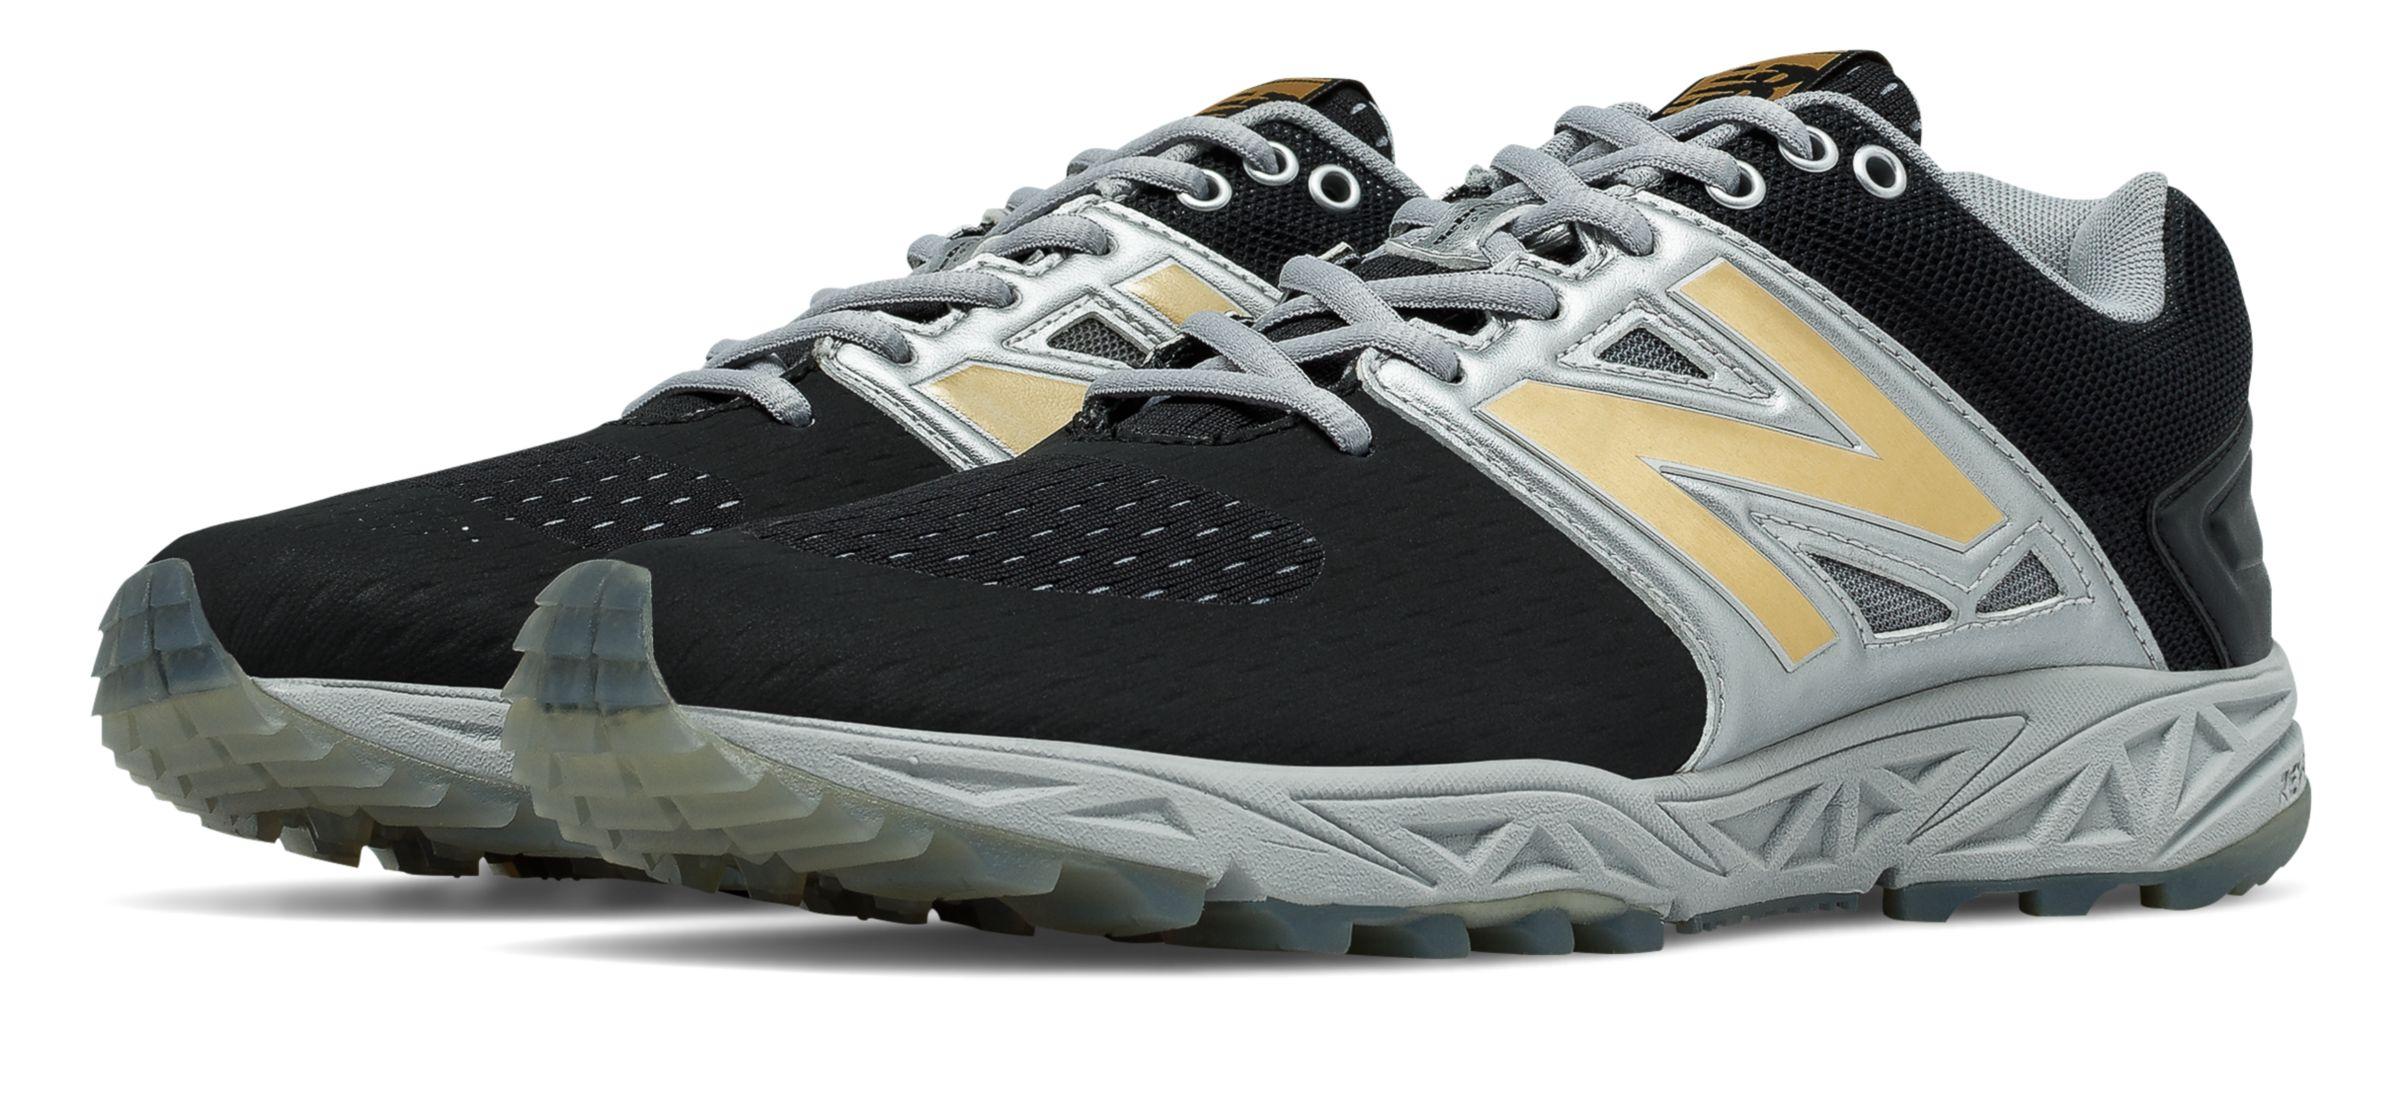 Men\u0027s New Balance Shoes Under $45 | Deep Discounts on New Balance Shoes |  Joe\u0027s New Balance Outlet